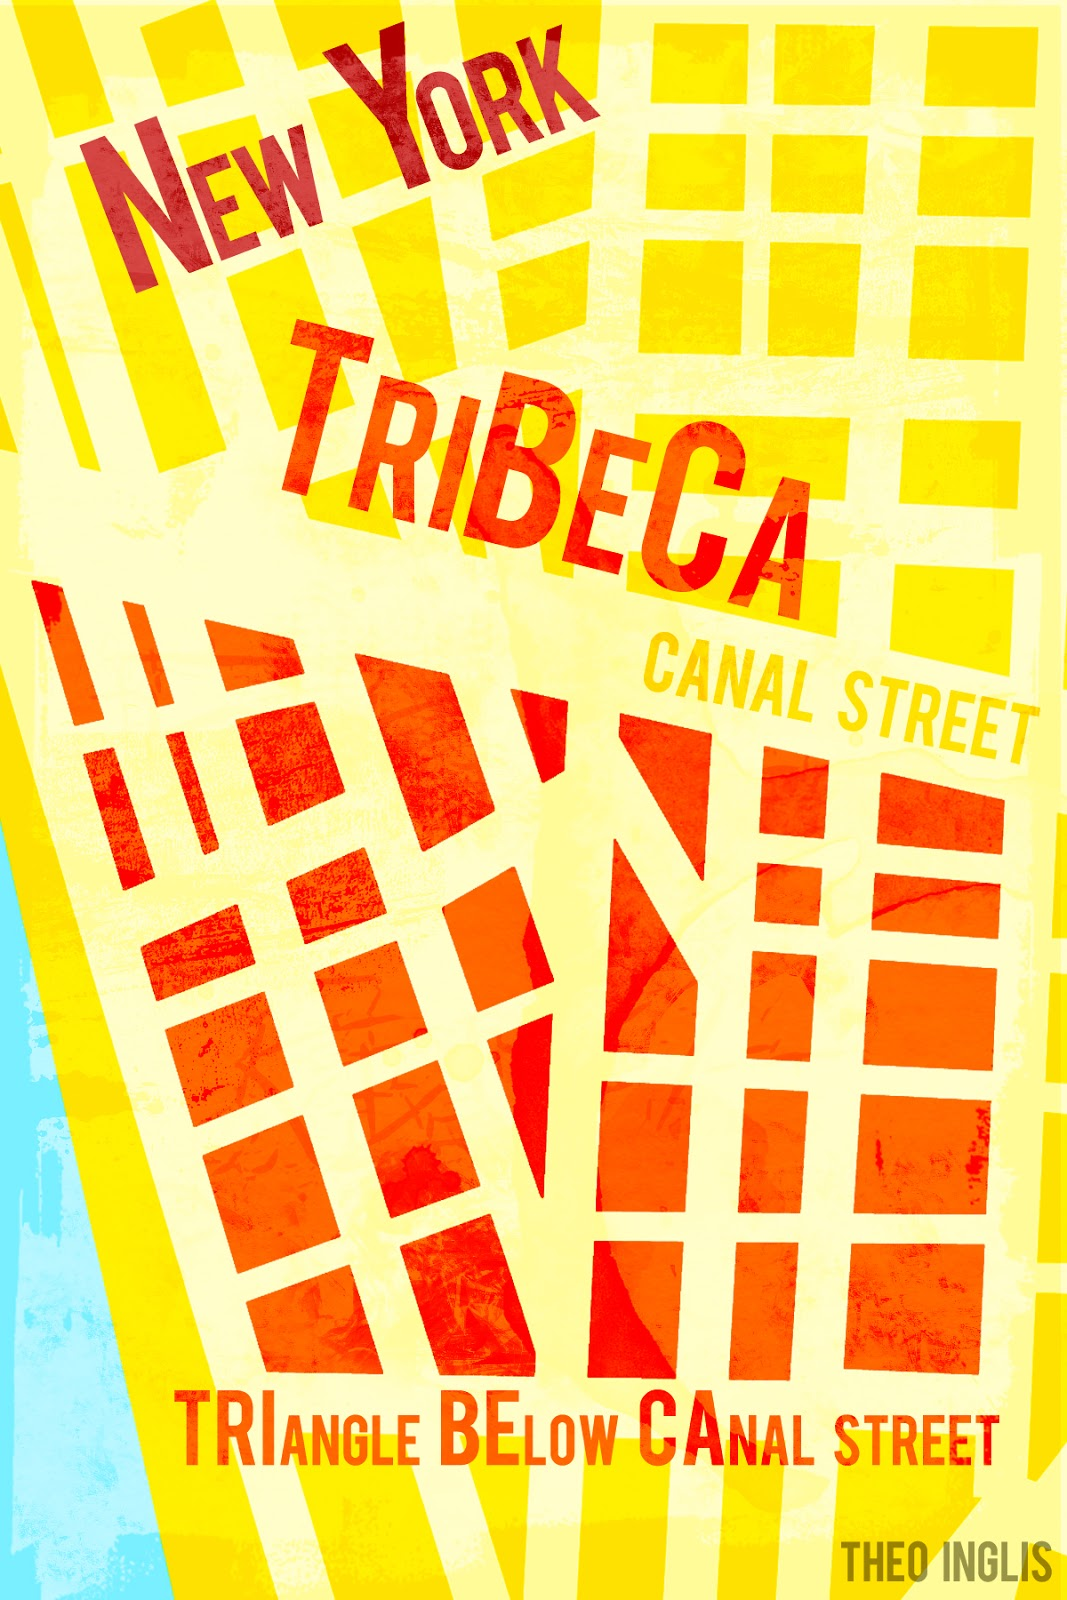 TriBeCa New York Postcard by Theo Inglis